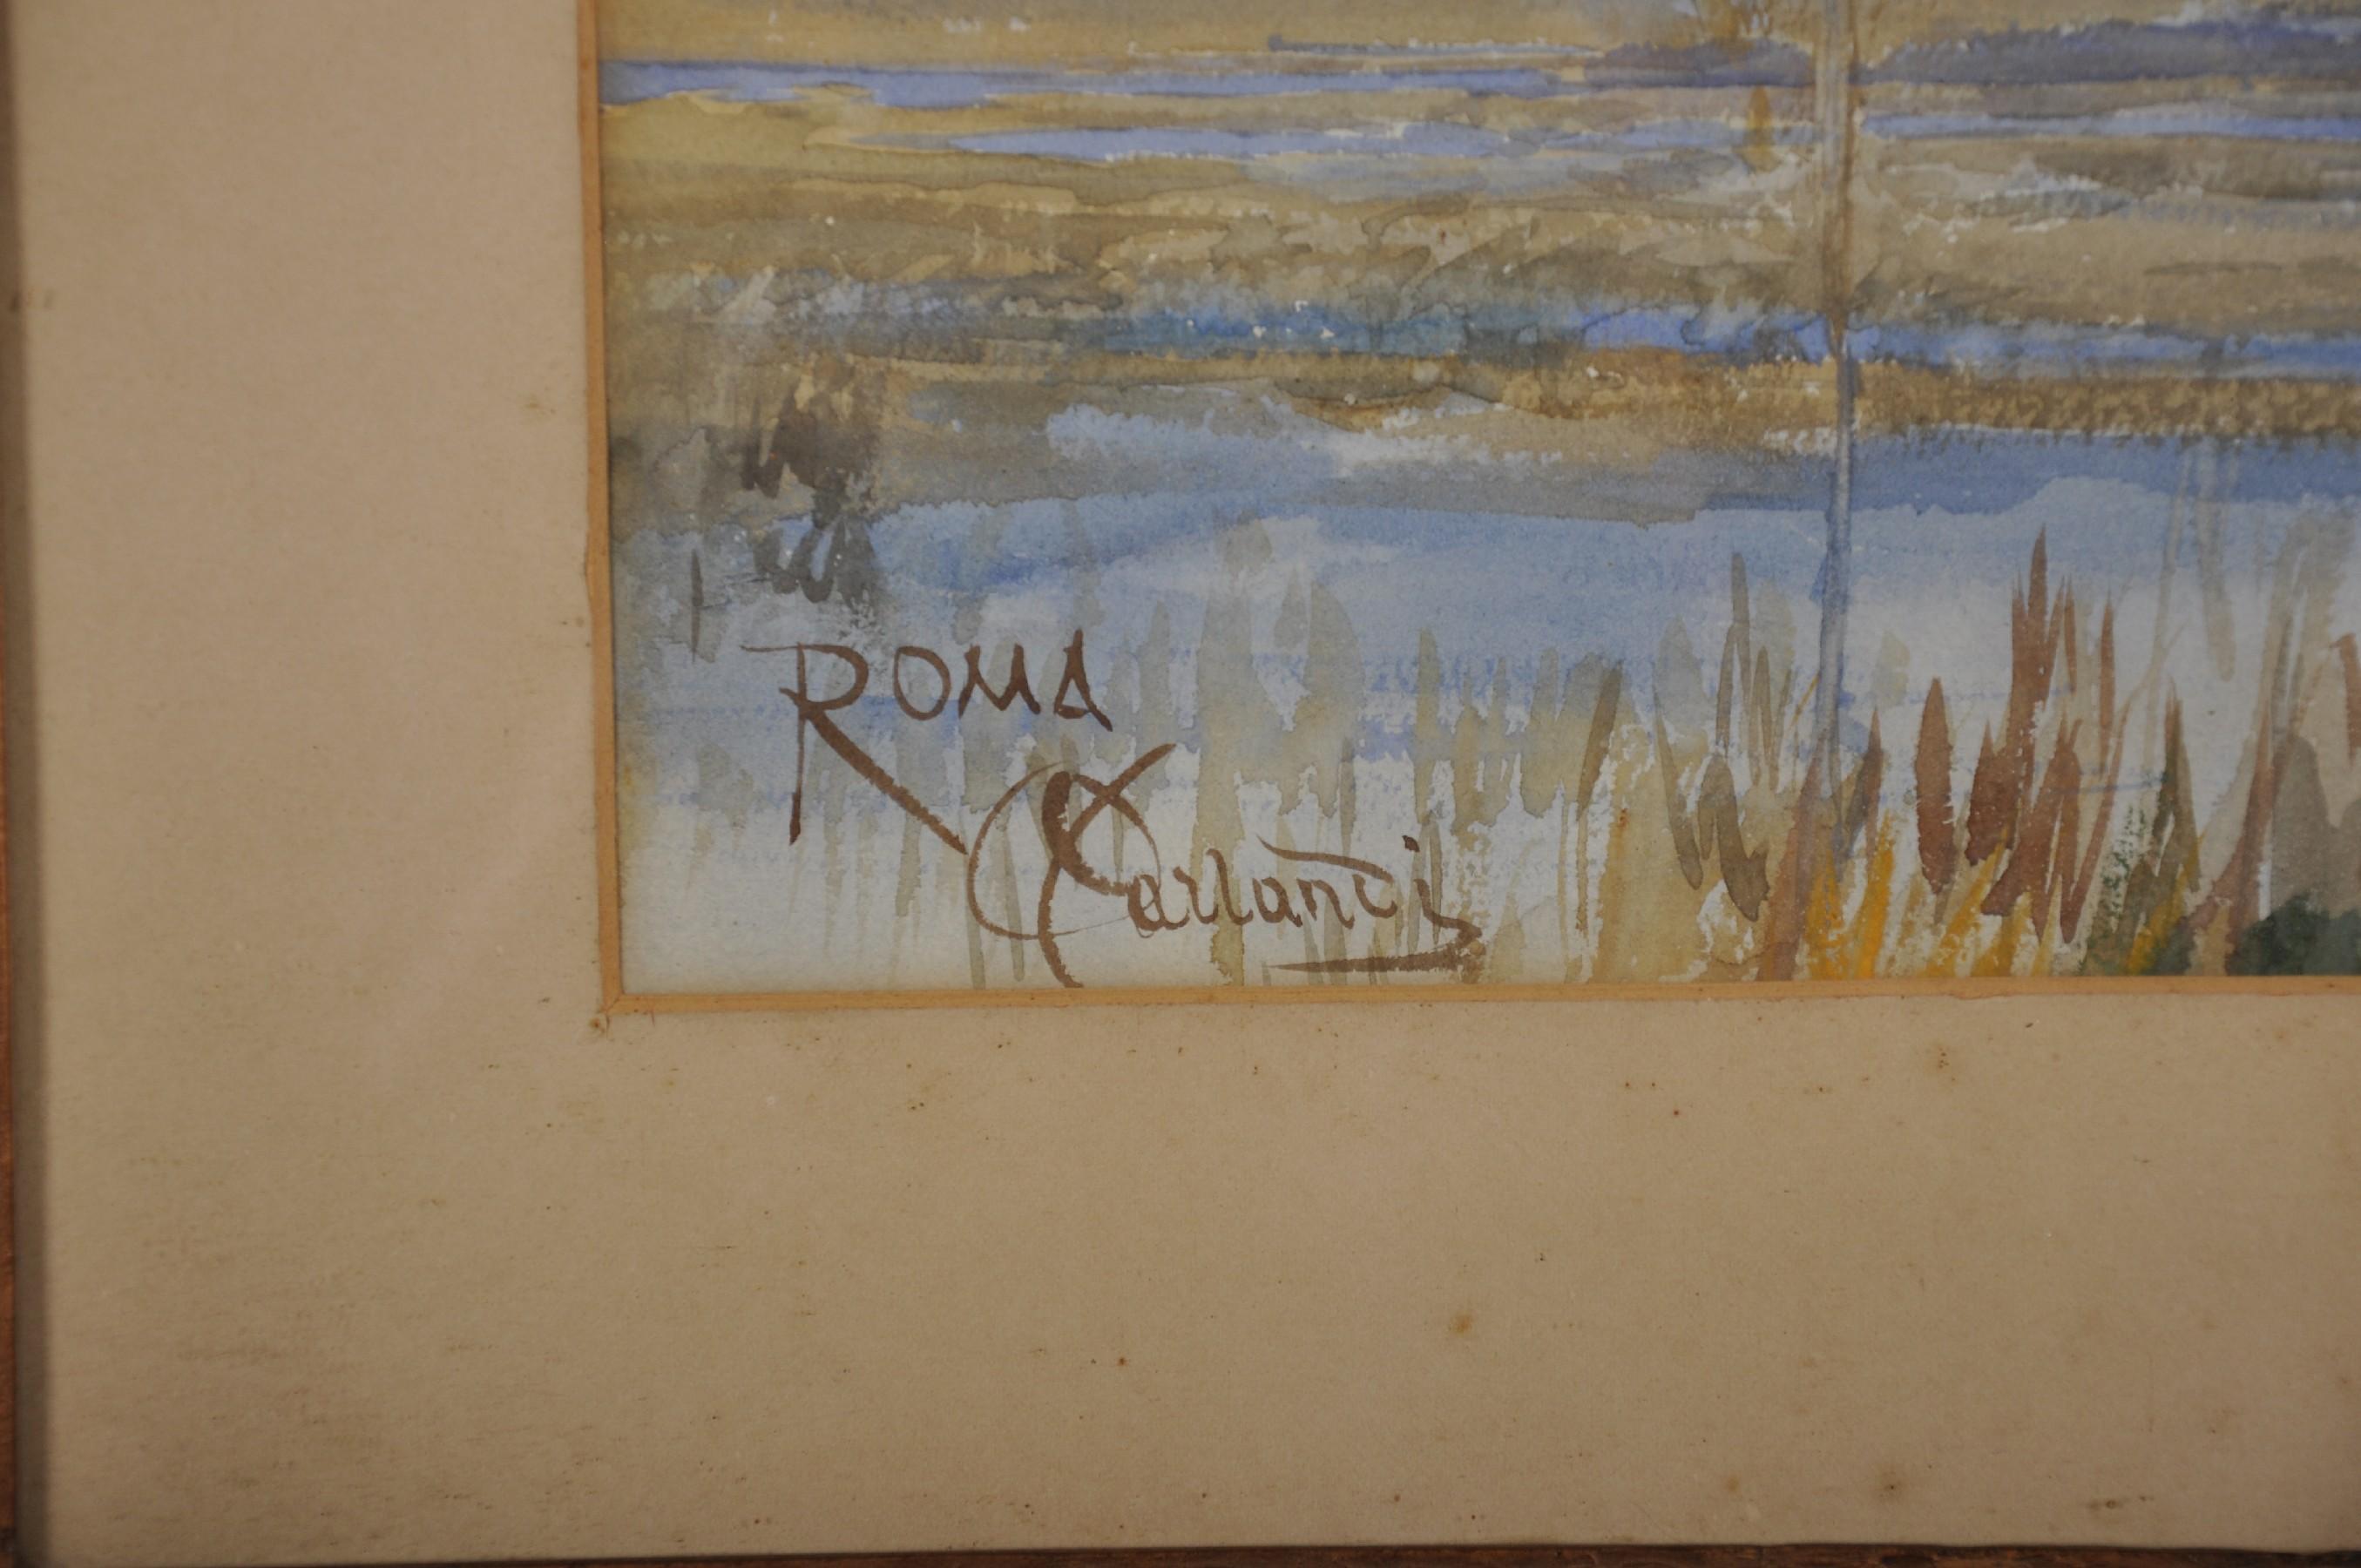 Onorato Carlandi (1848-1939) Italian. A River Landscape, Watercolour, Signed and Inscribed 'Roma', - Image 3 of 4